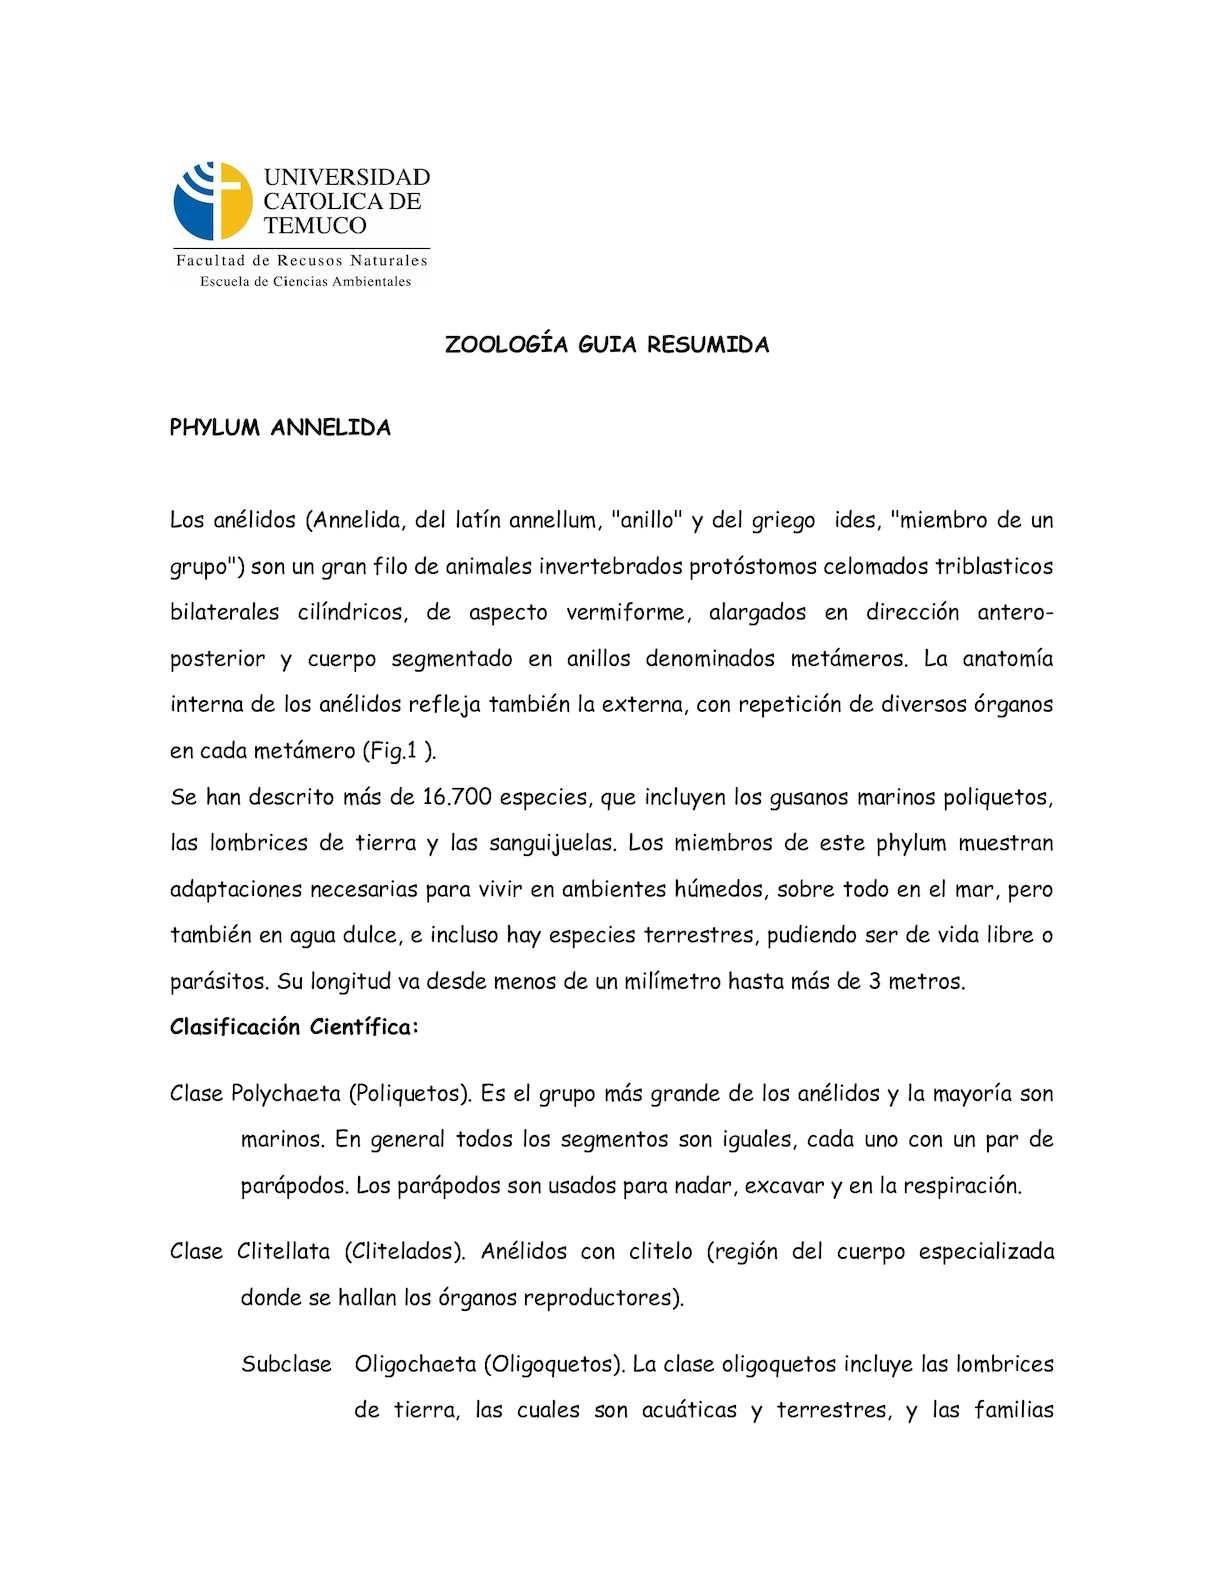 Calaméo - Versión Resumida Laboratorio Anelidos 2015